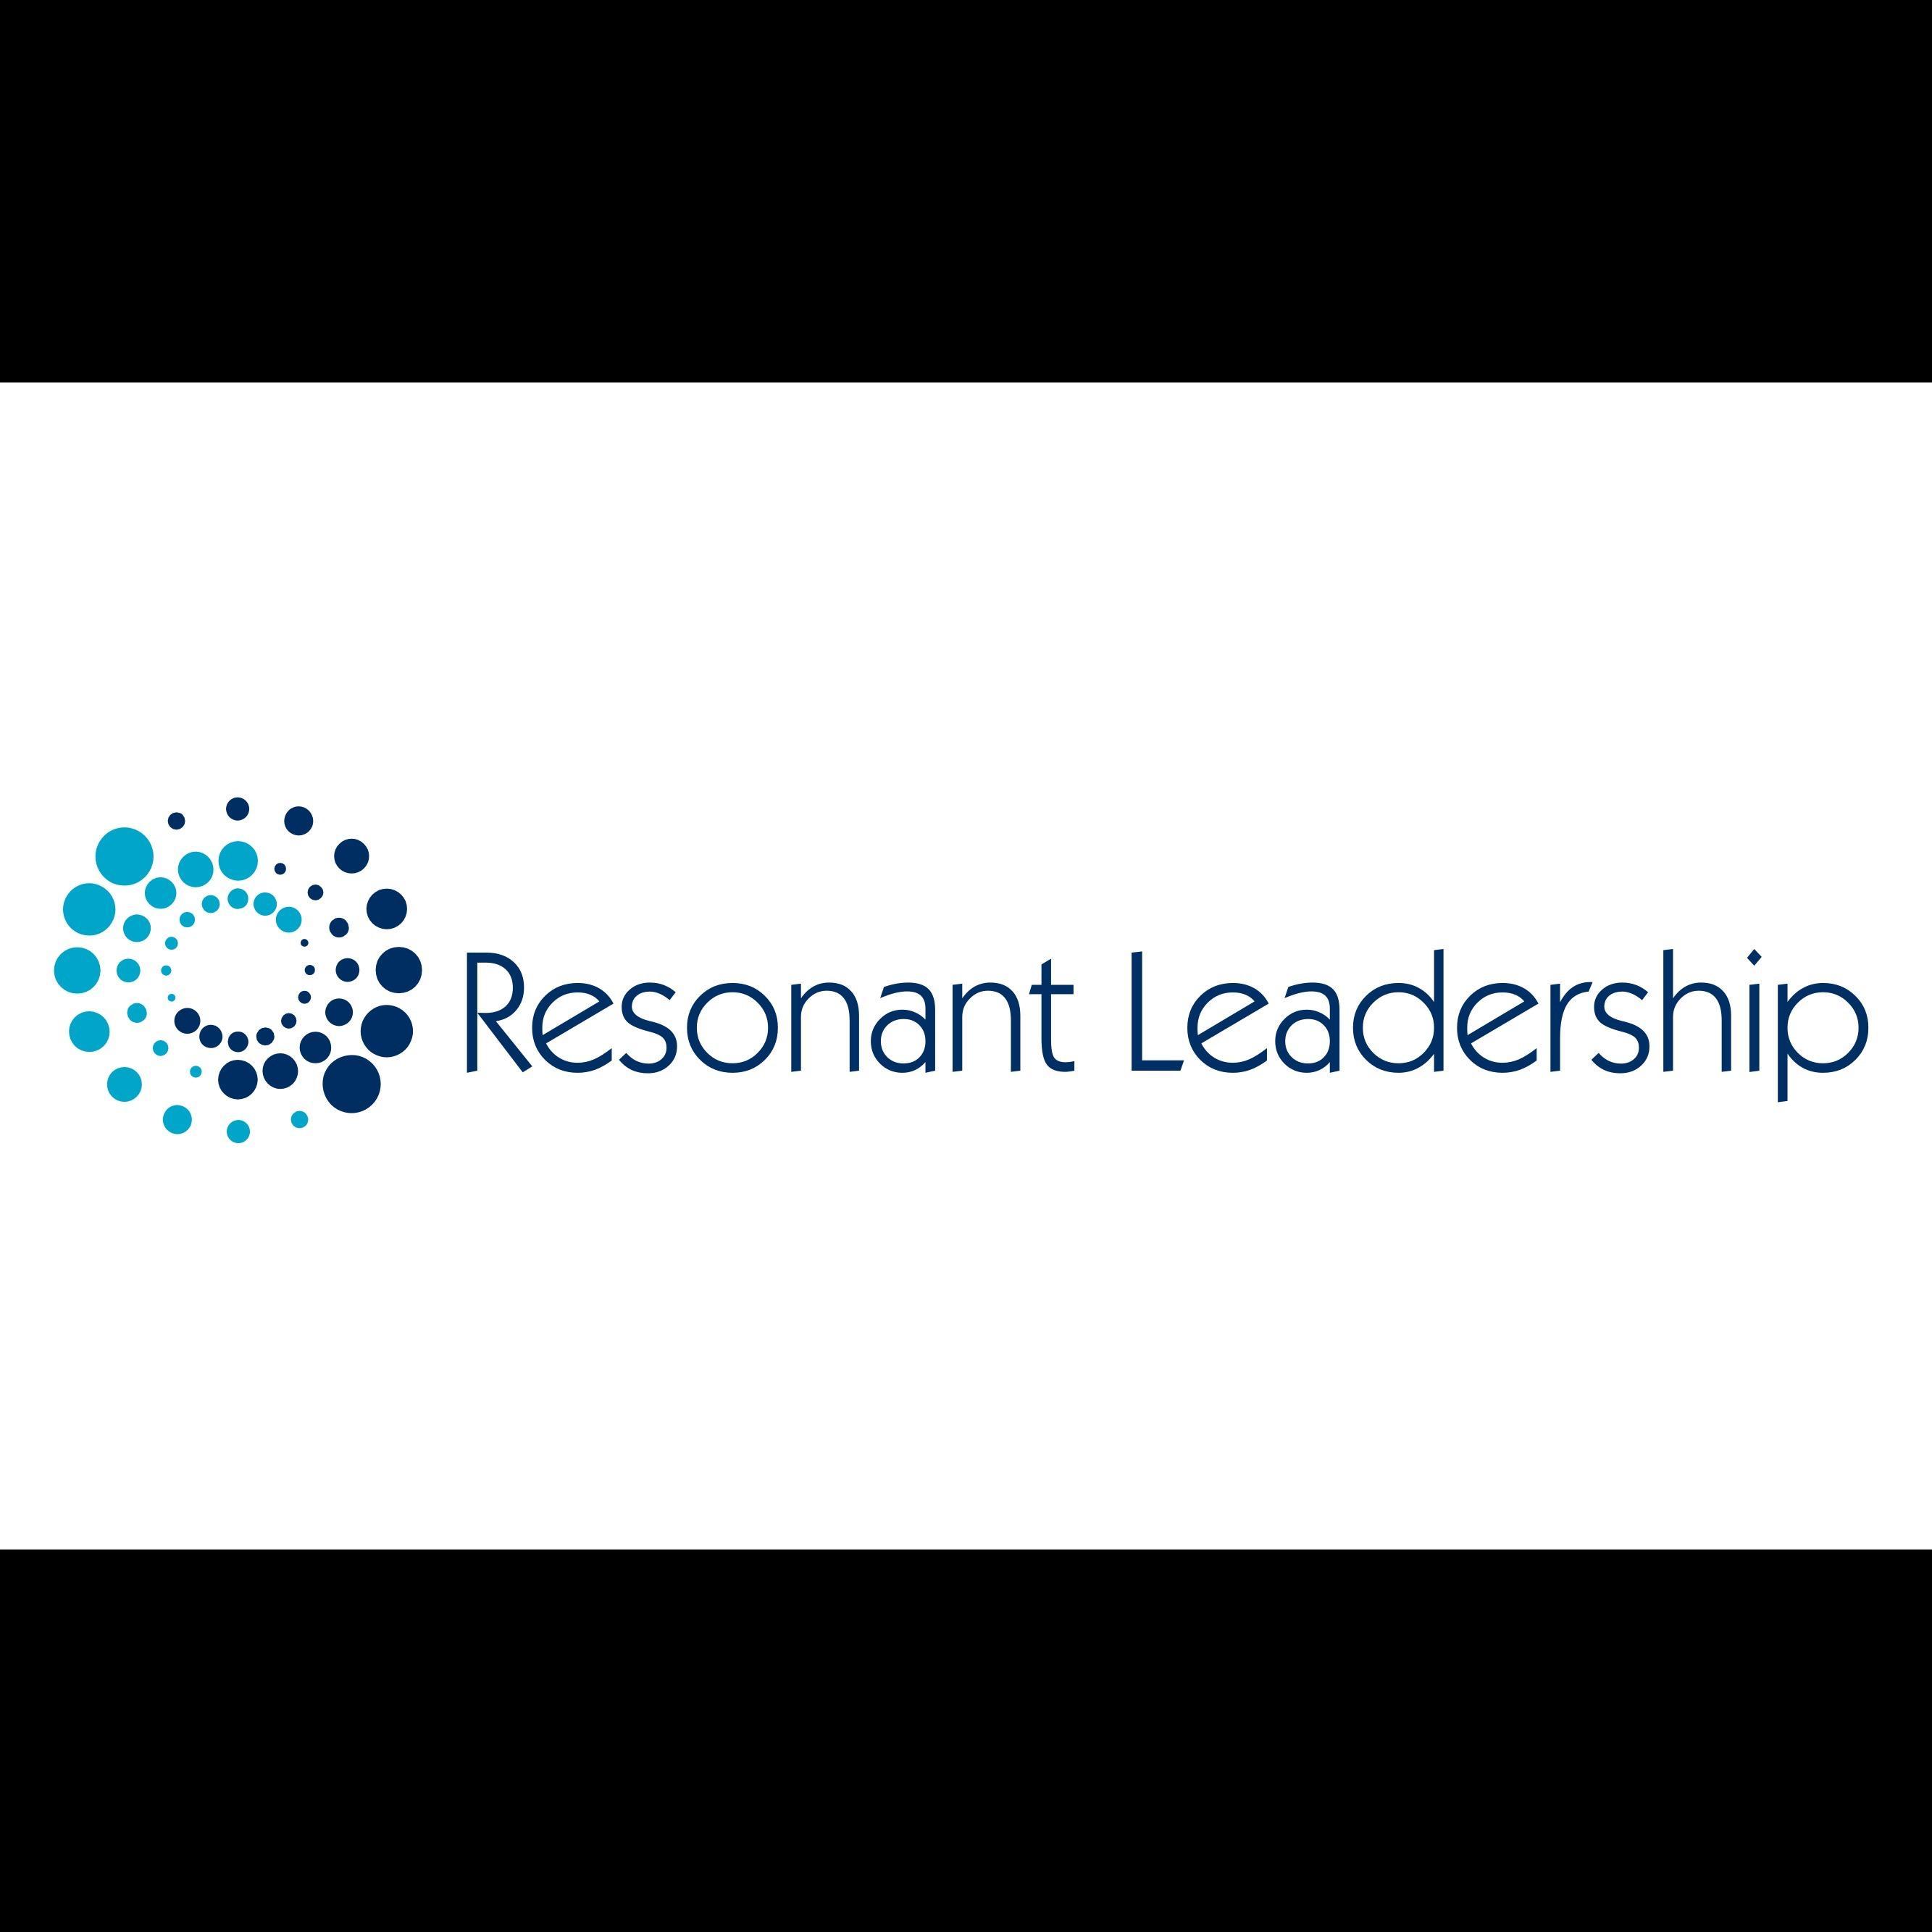 Resonant Leadership, LLC